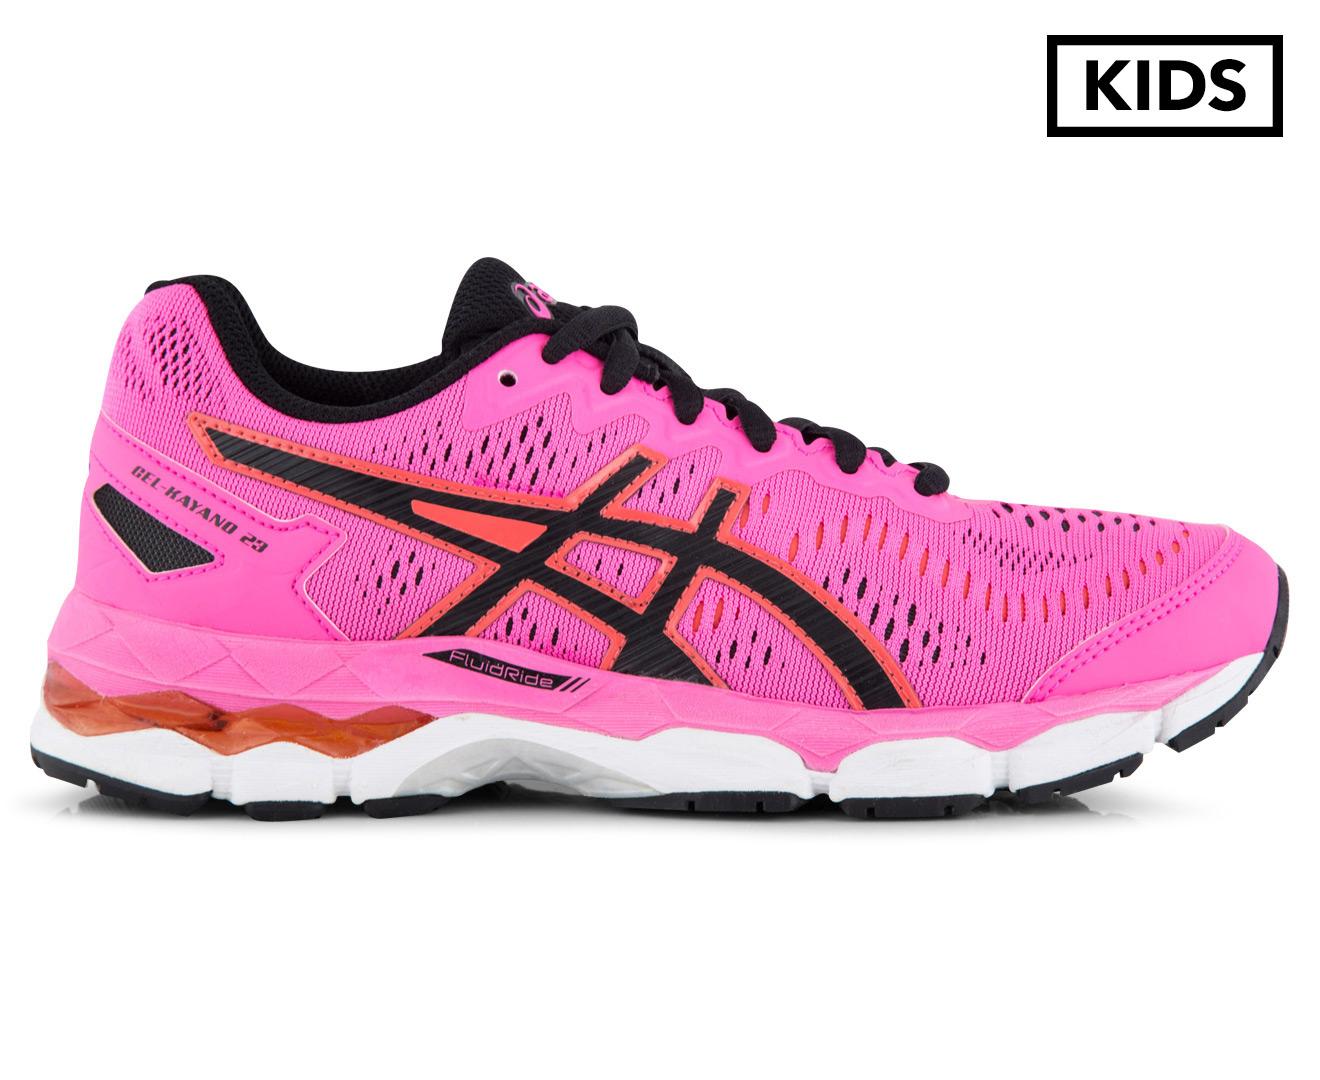 ASICS Grade-School Kids' GEL-Kayano 23 Shoe - Hot Pink/Black/White   Great  daily deals at Australia's favourite superstore   Catch.com.au